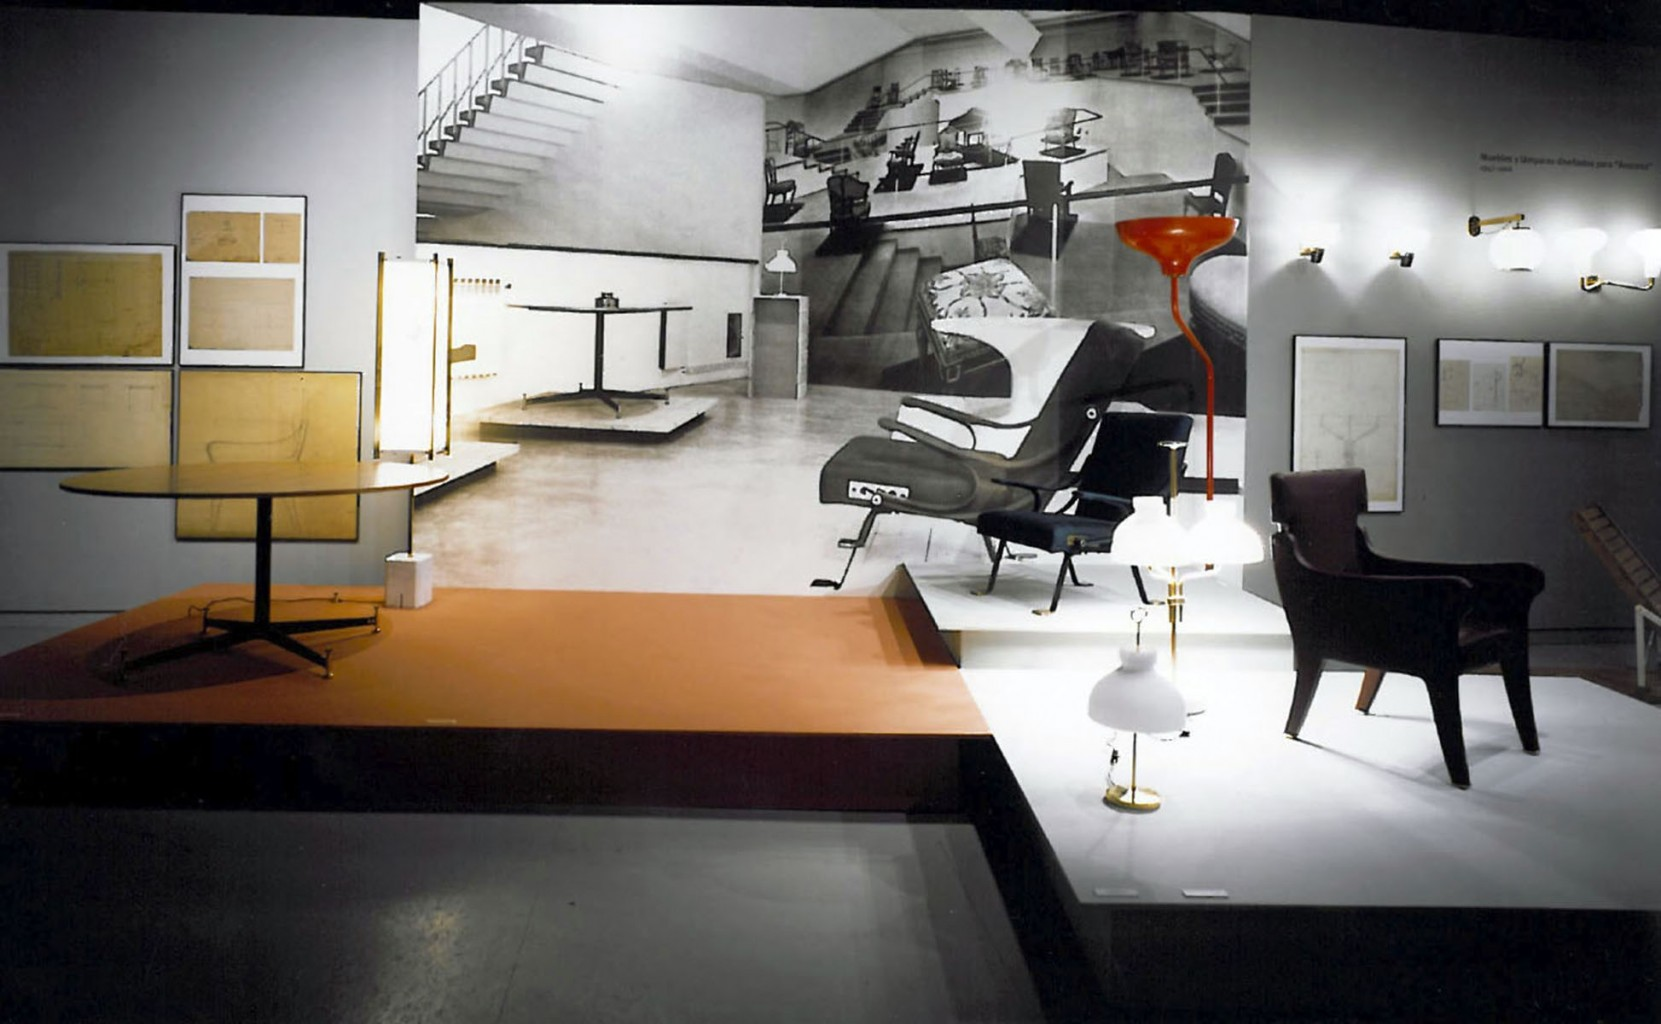 Exposición Ignazio Gardella 1905-1999, Arquitectura a través de un Siglo Blanca Lleó 01d